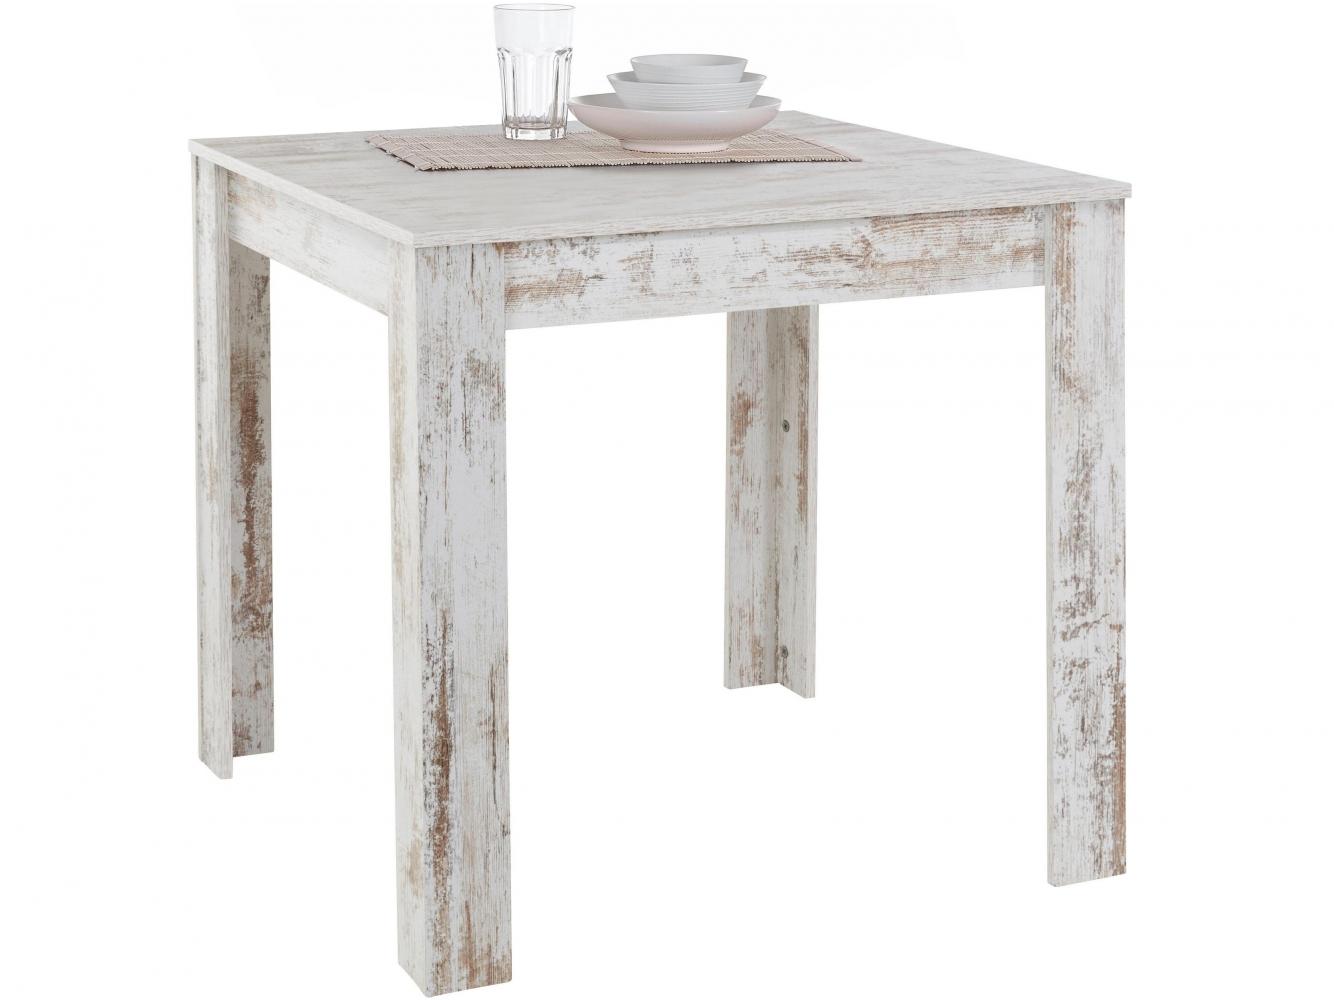 Jídelní stůl Lora II., 80 cm, bílá